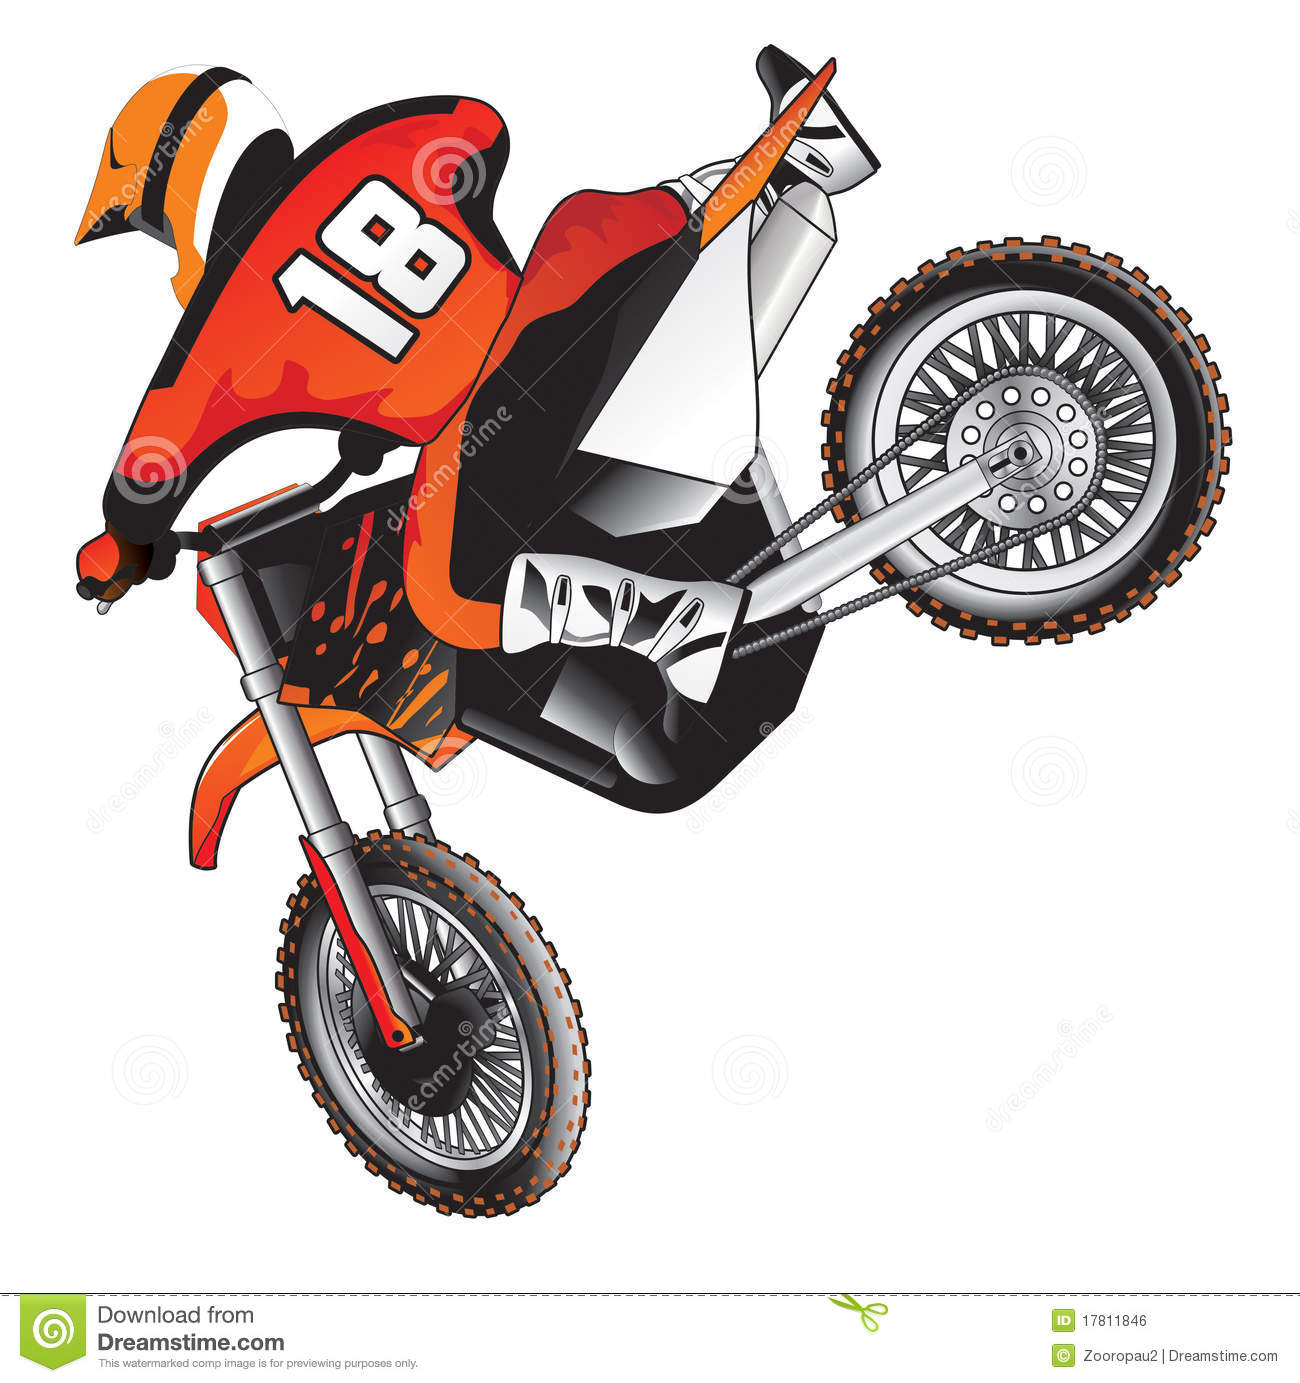 Motocross tools clipart free.